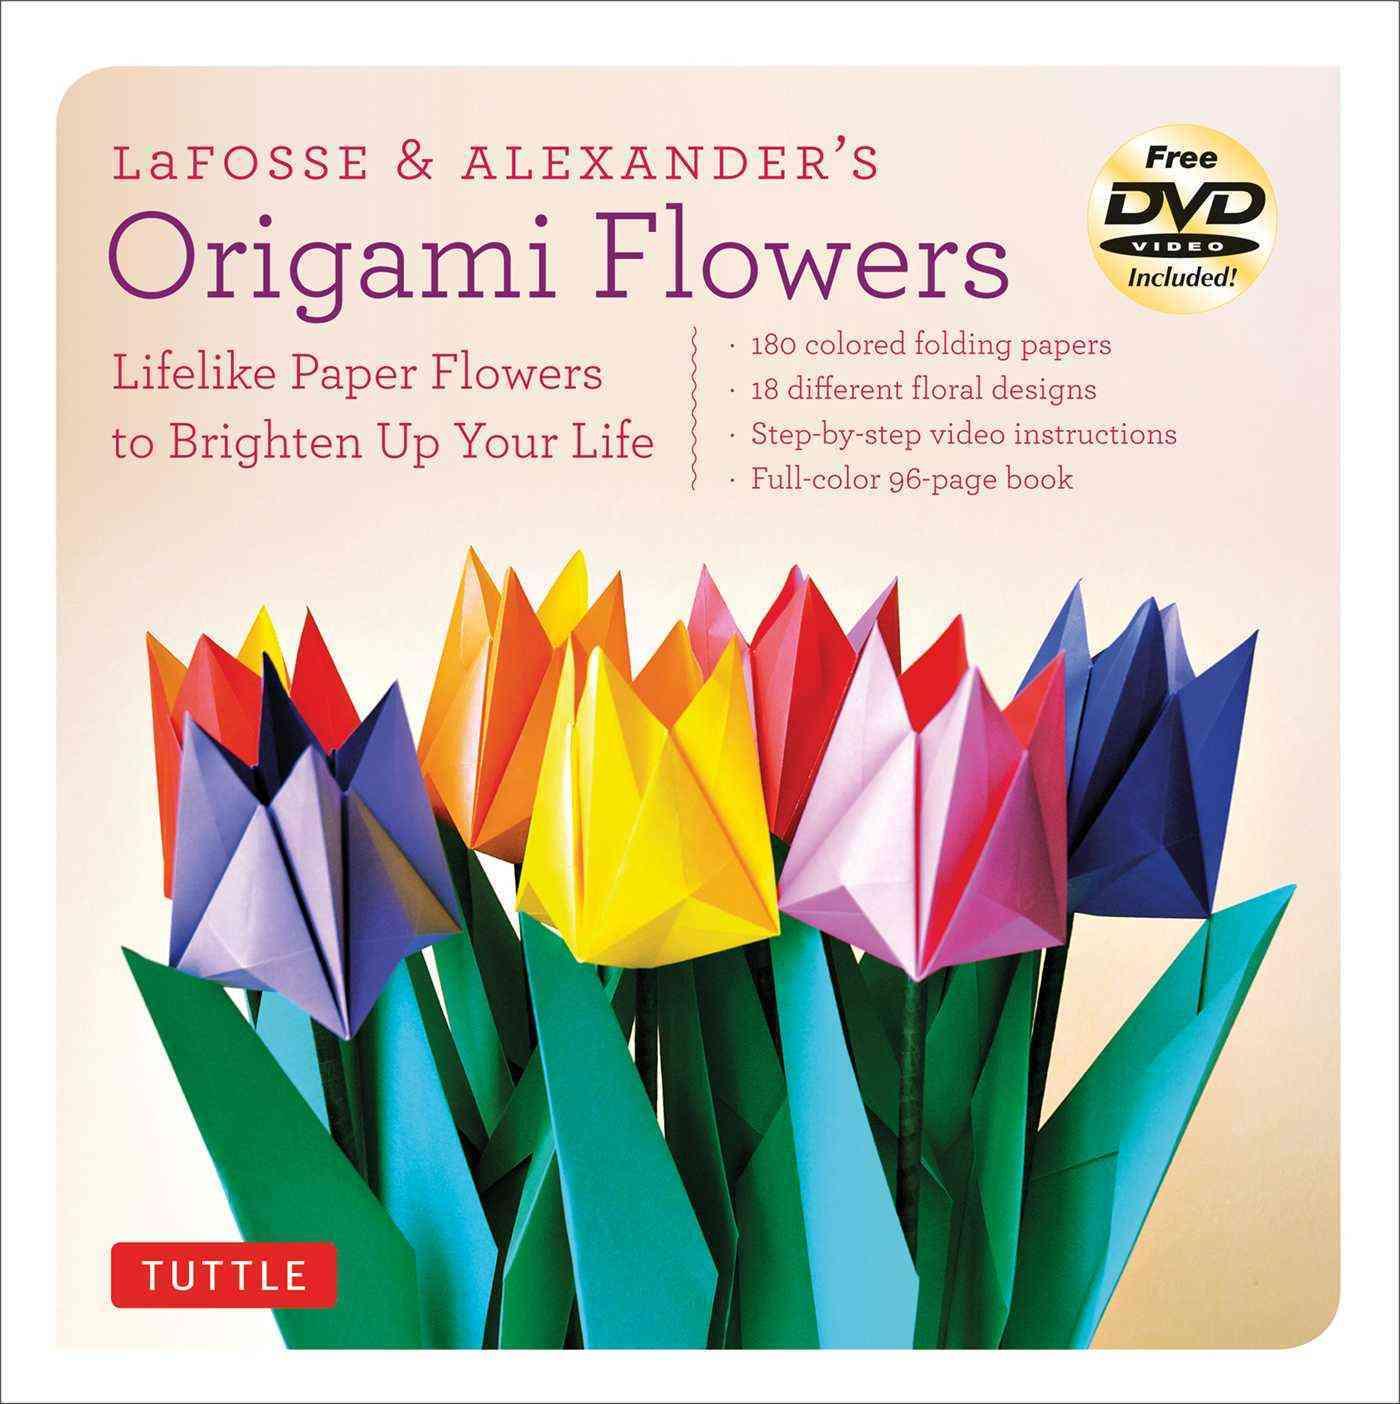 Lafosse & Alexander's Origami Flowers Kit By LaFosse, Michael G./ Alexander, Richard L.